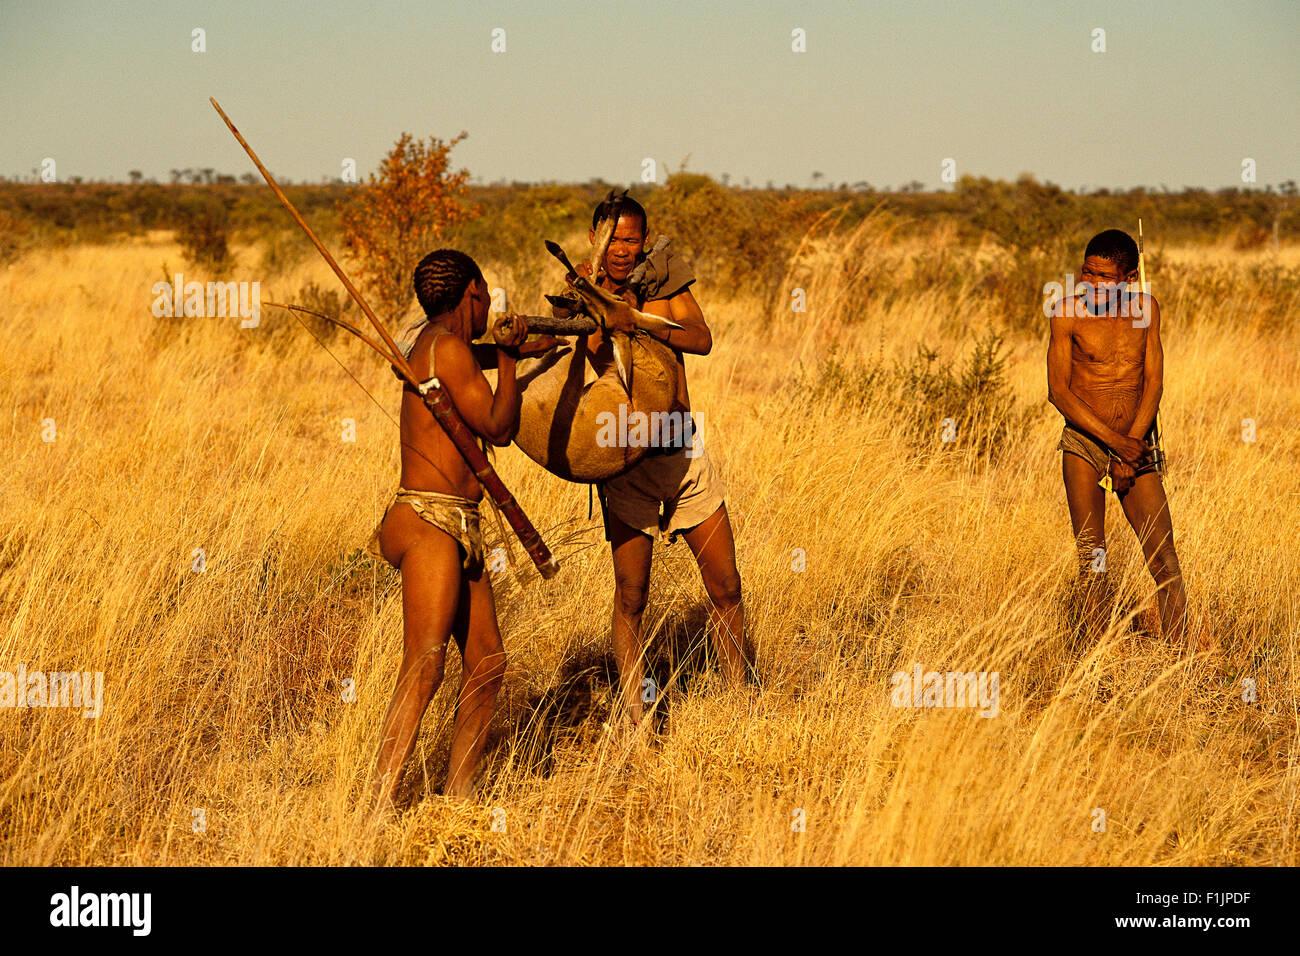 Bushmen Carrying Their Kill Botswana, Africa - Stock Image